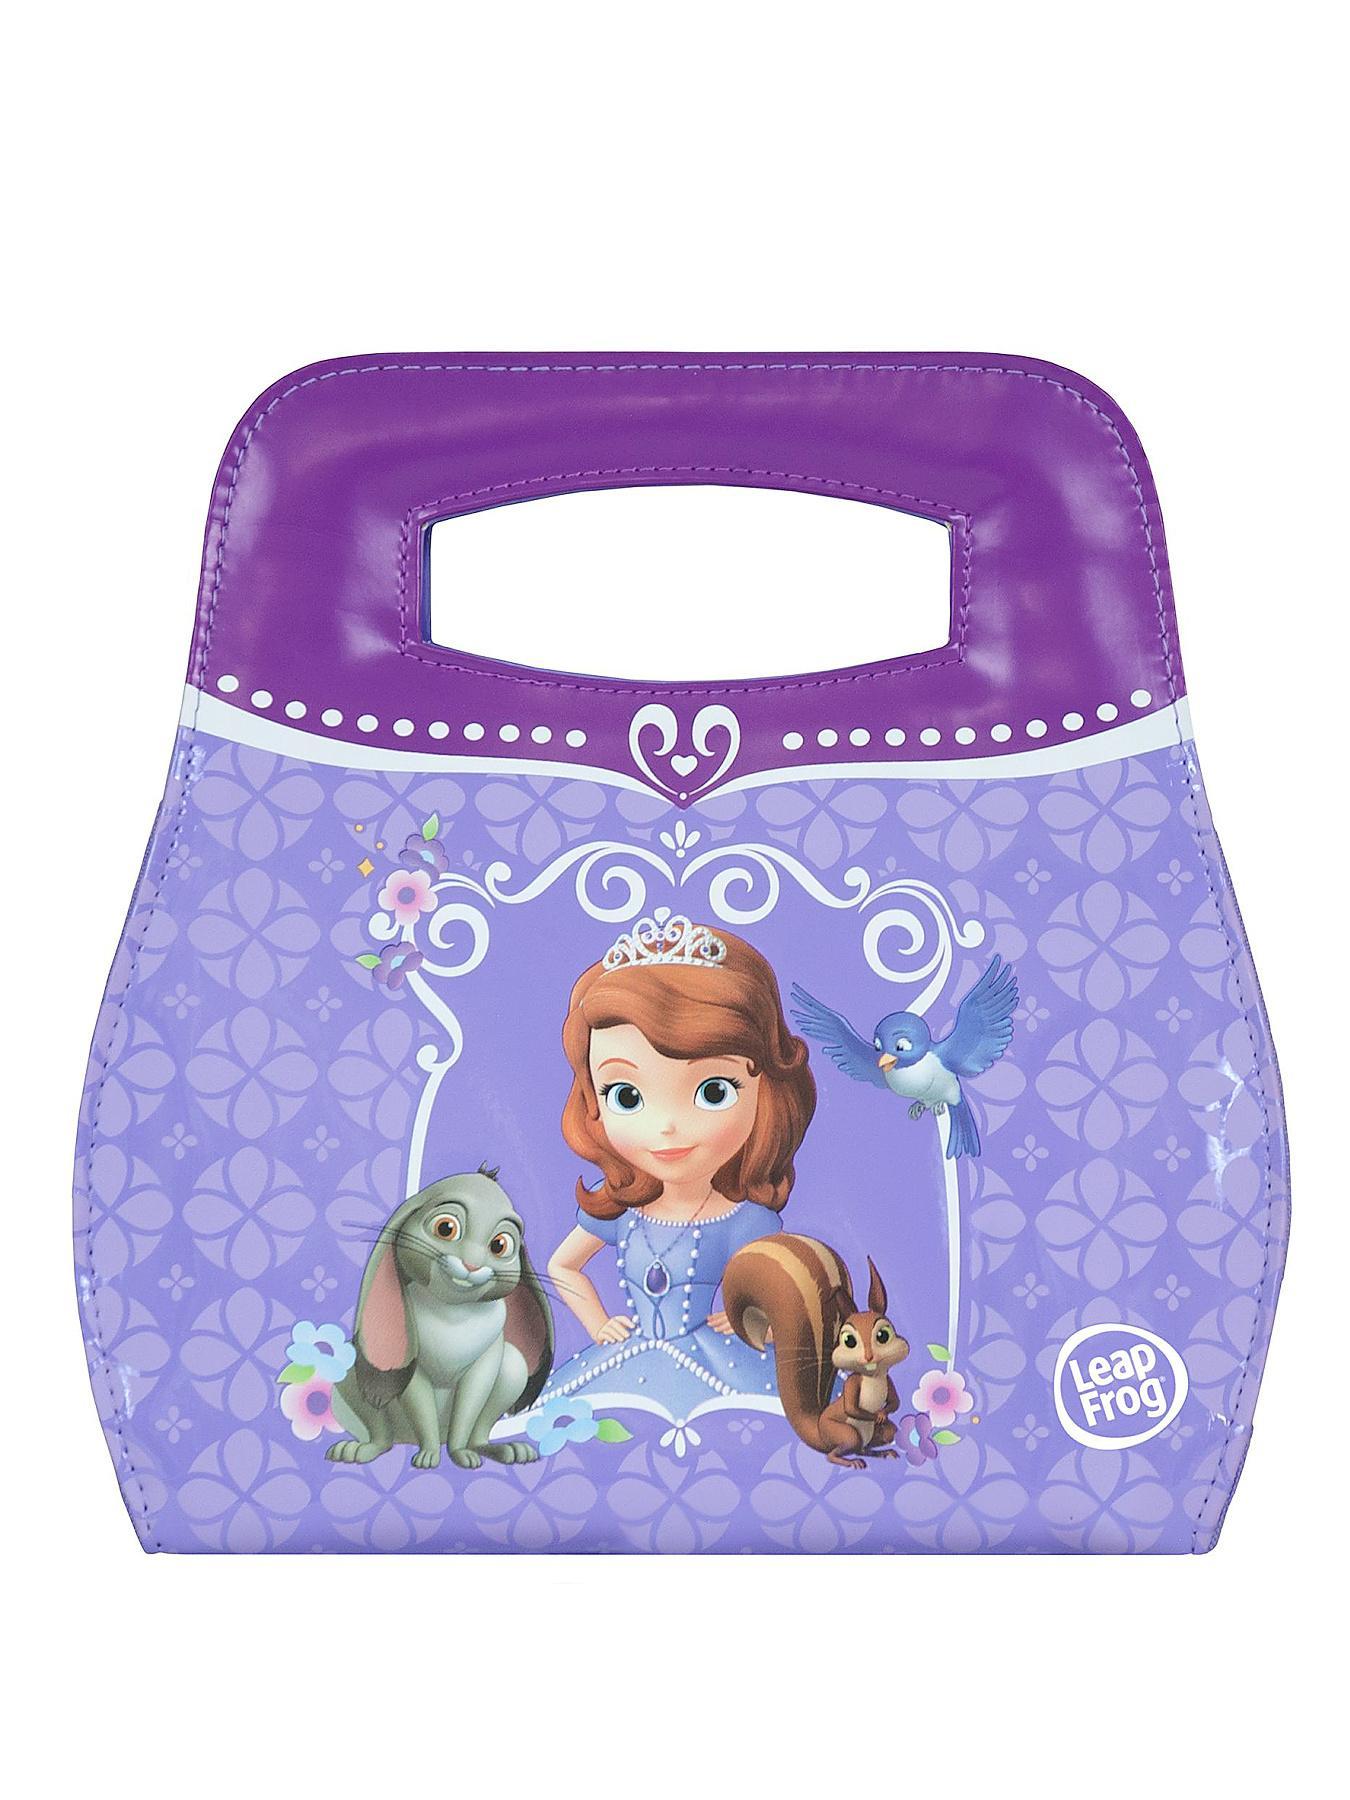 LeapFrog LeapPad Princes Sofia Handbag